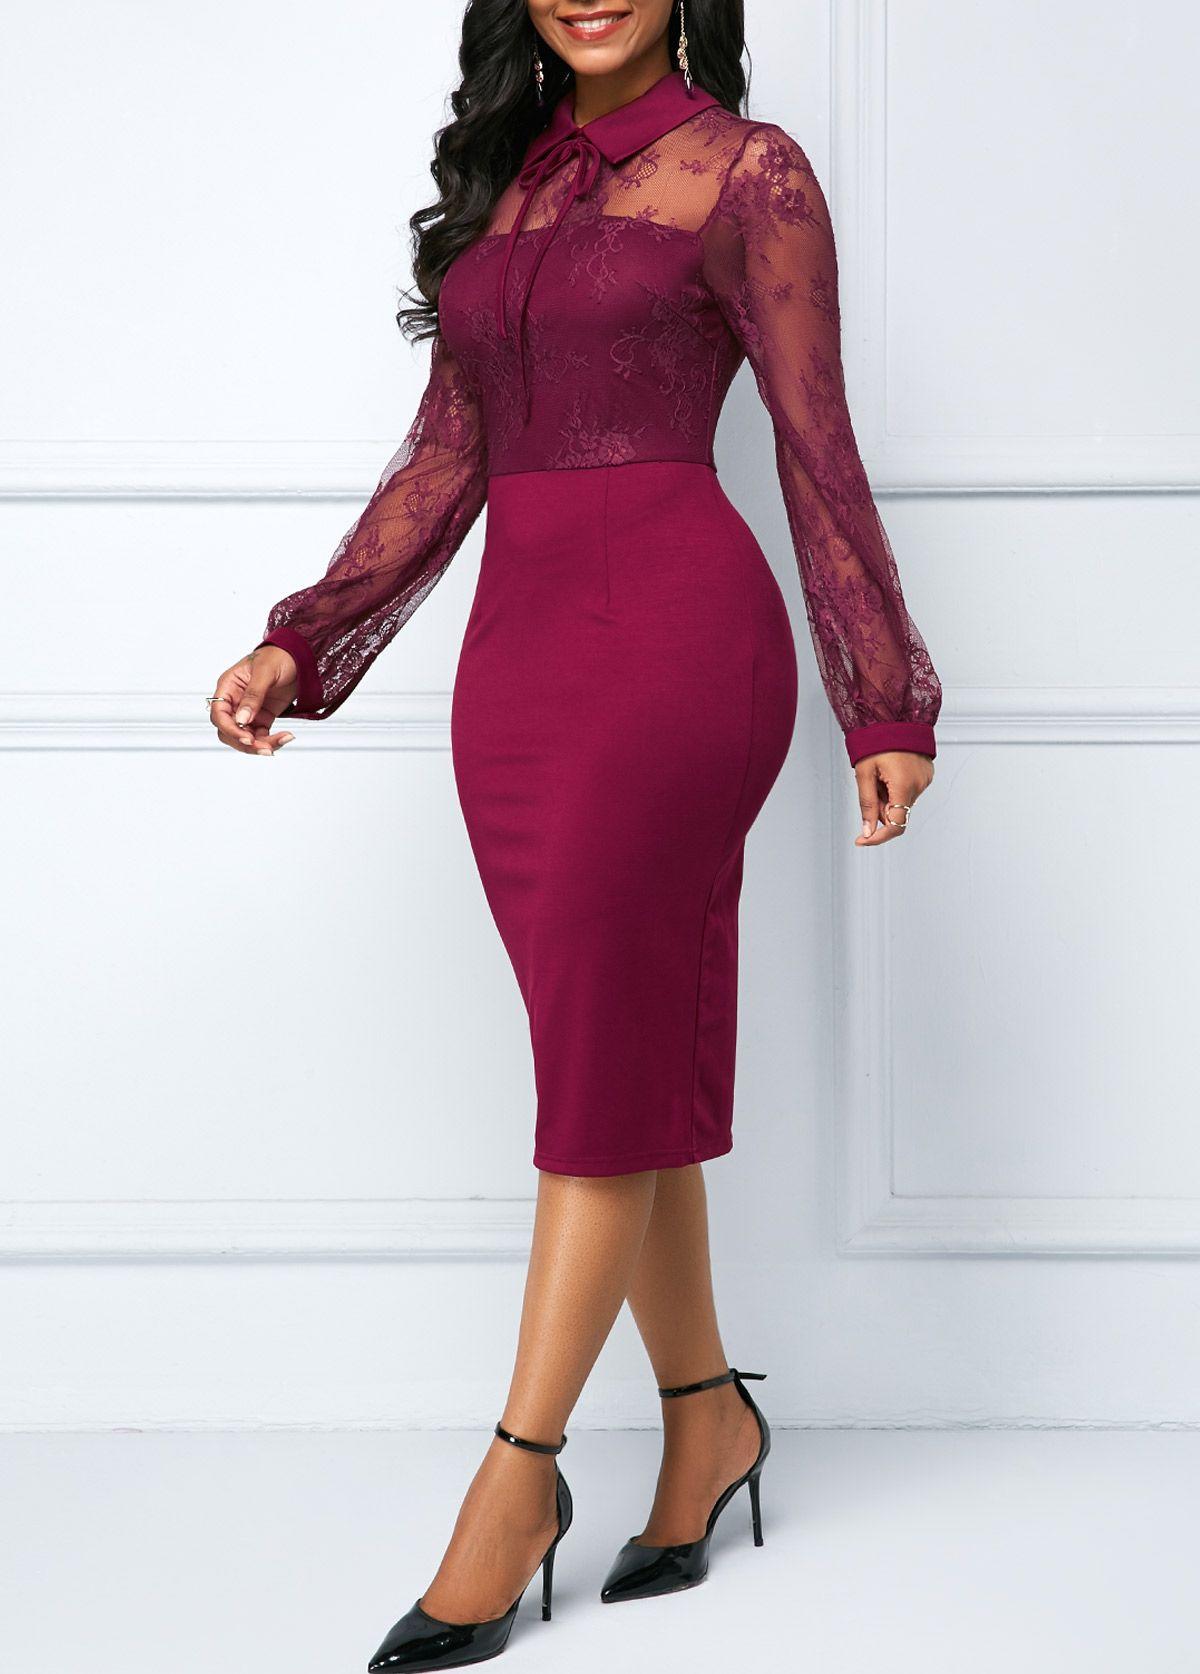 ad6951fdca8c Back Slit Lace Patchwork Sheath Dress   Rotita.com - USD $30.63 ...